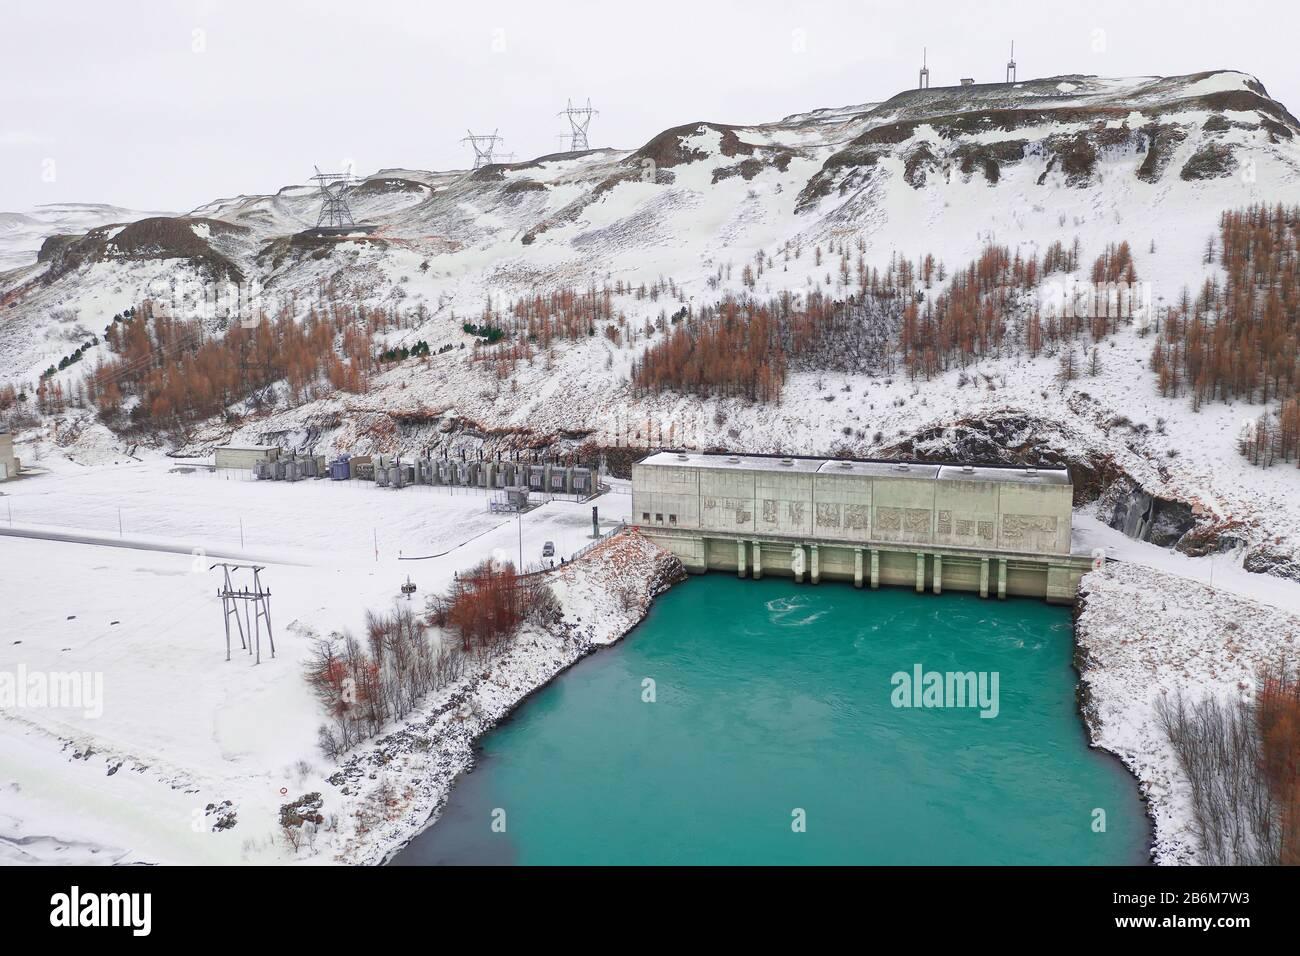 Burfellsvirkjun Hydro Power Plant, Thjorsardalur, Iceland Stock Photo